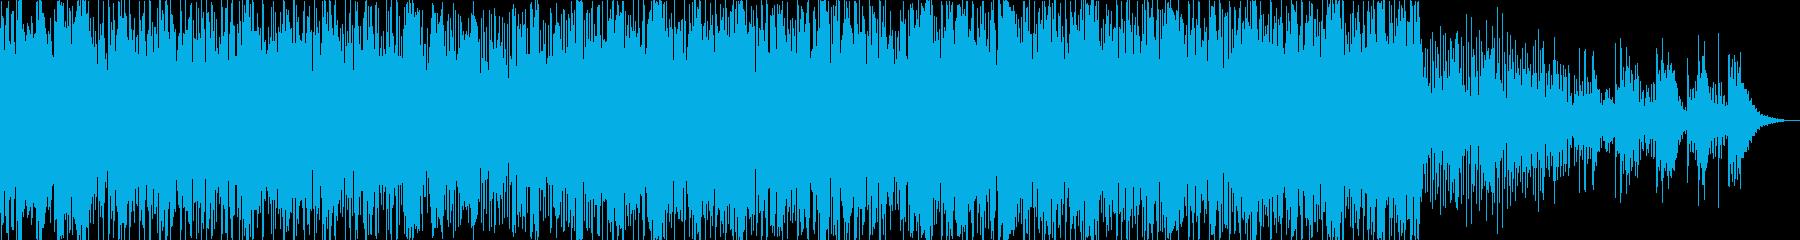 90s R&B風インストの再生済みの波形